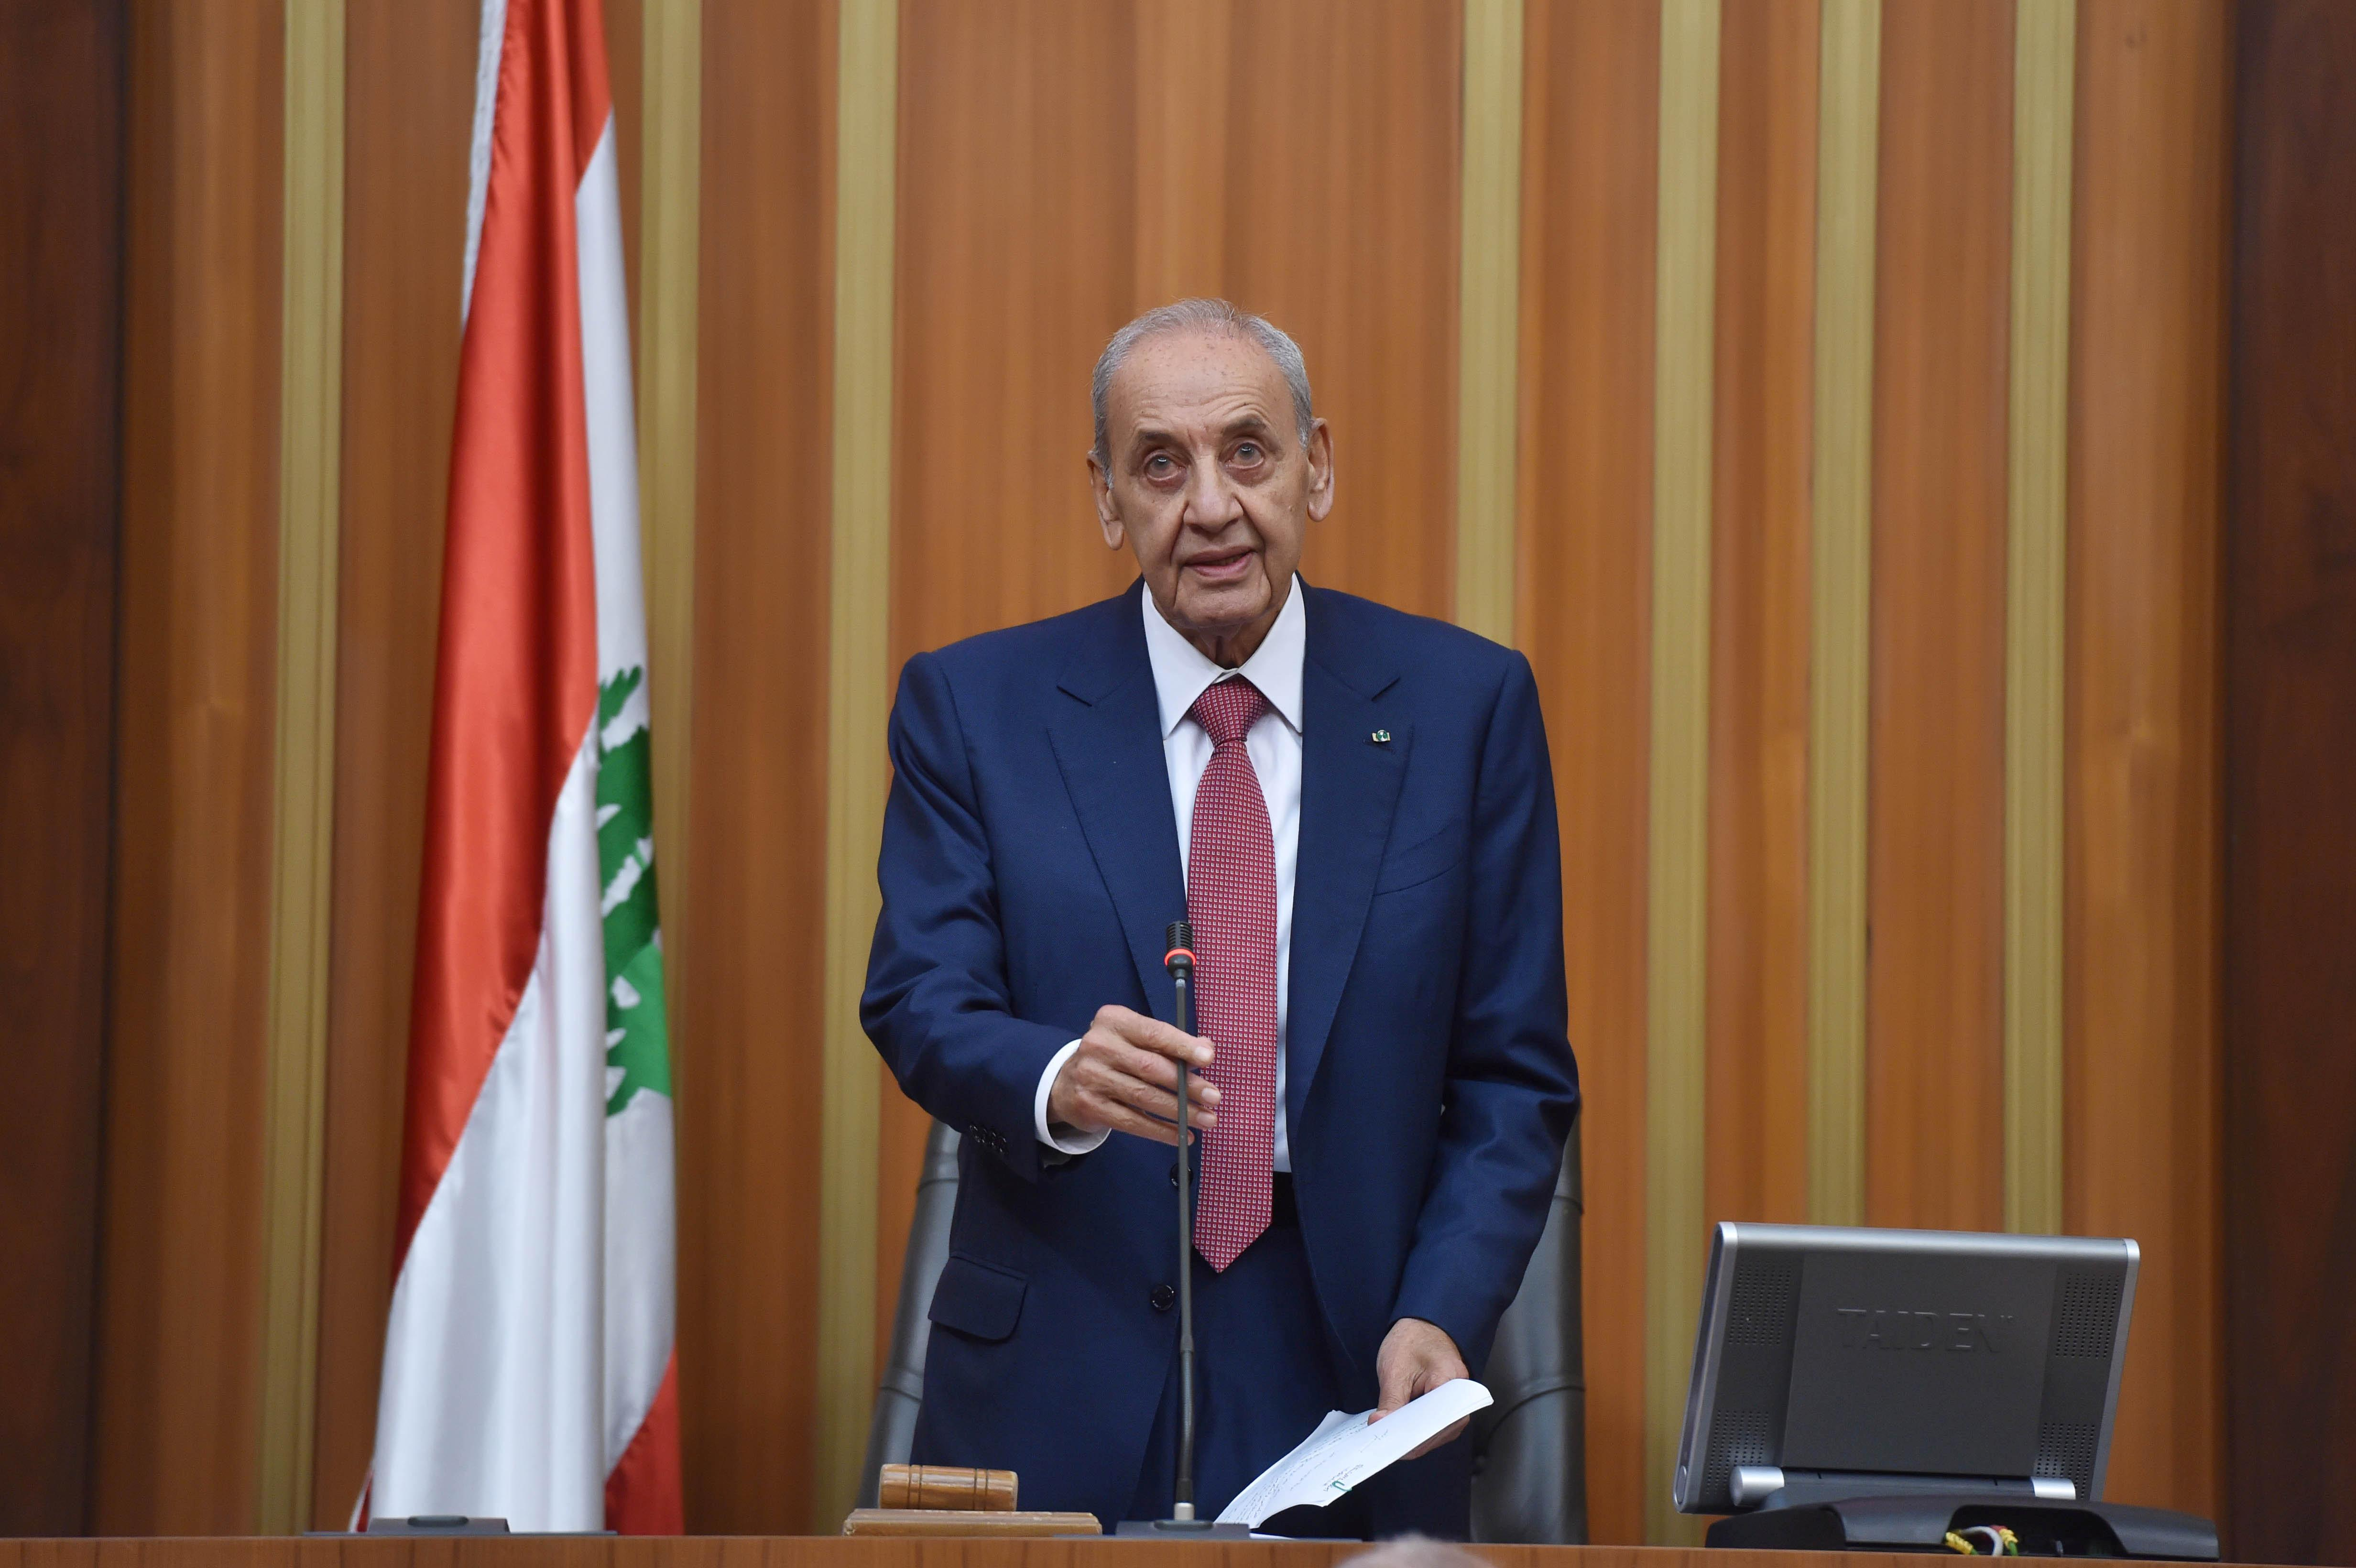 Lebanon parliament speaker calls session following cancellation